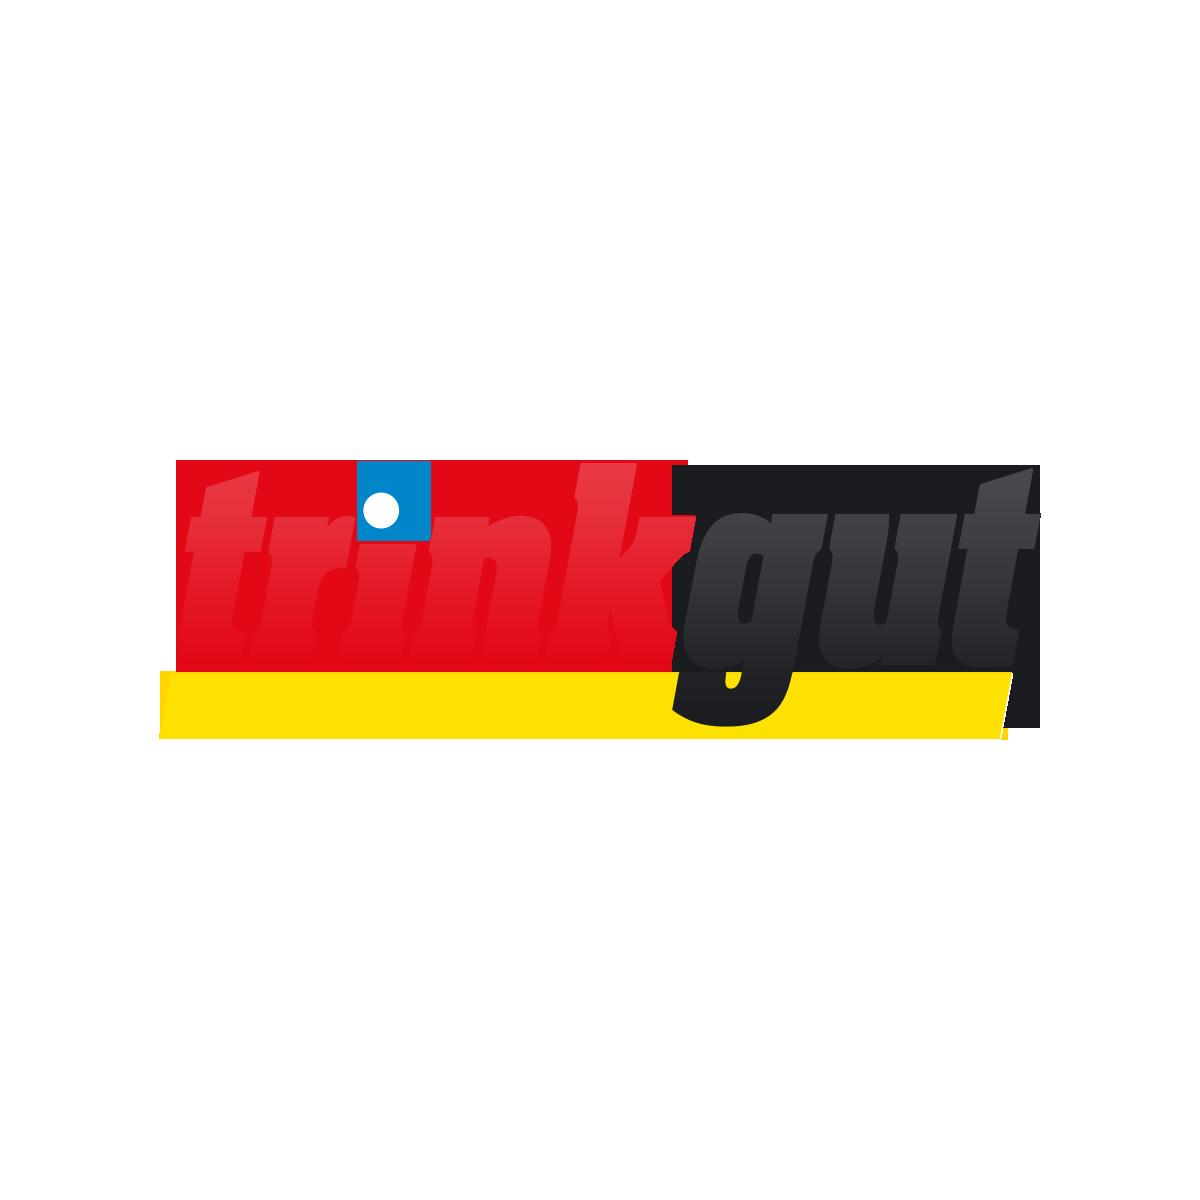 trinkgut Fachdiscount GmbH